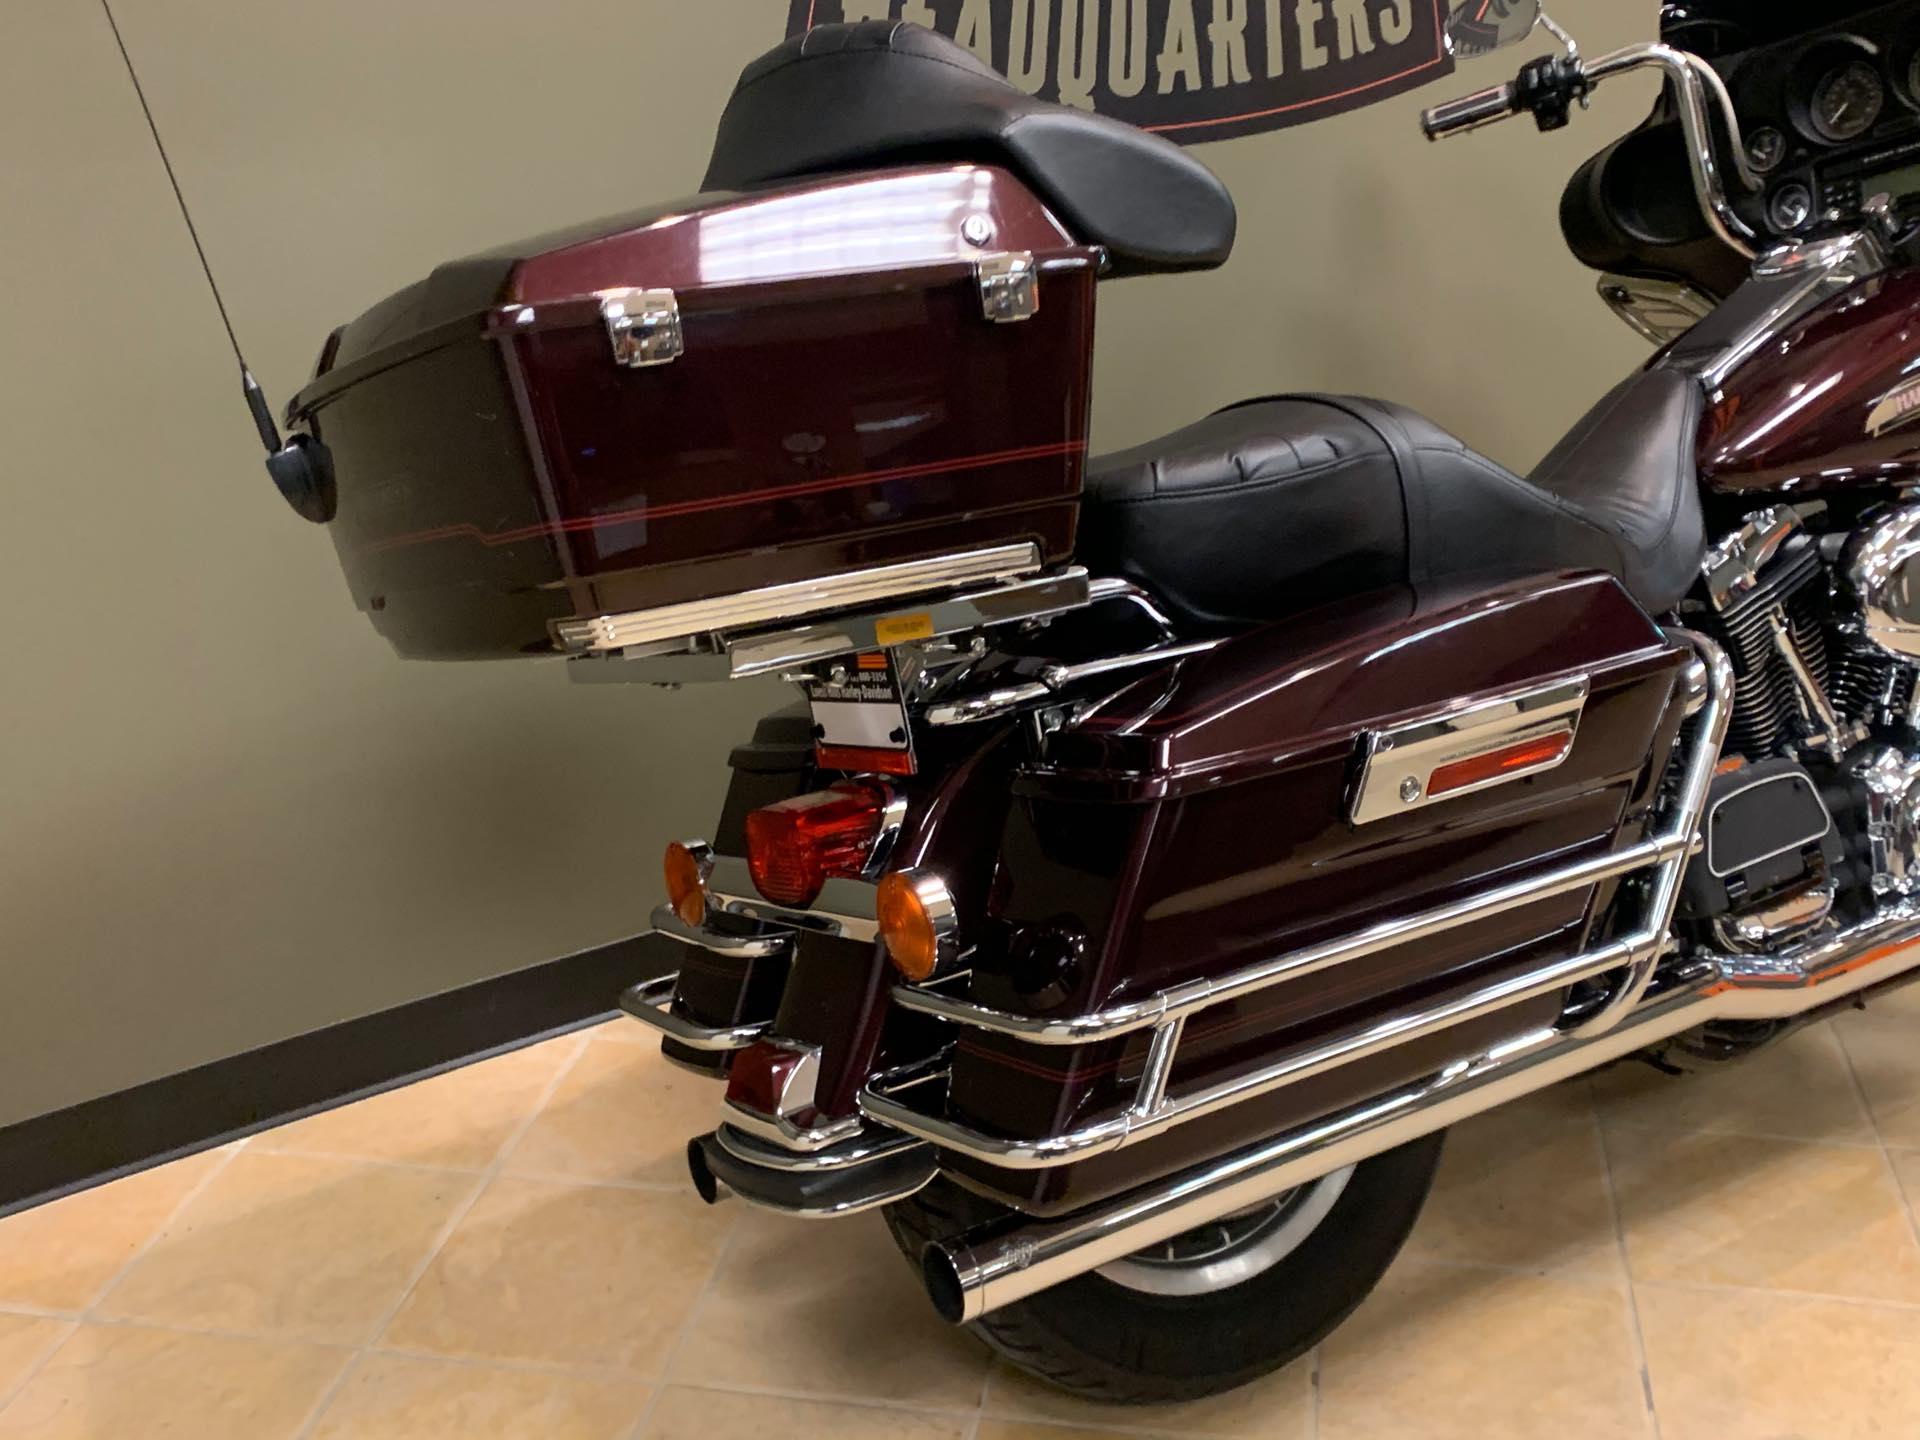 2007 HARLEY-DAVIDSON FLHTC at Loess Hills Harley-Davidson